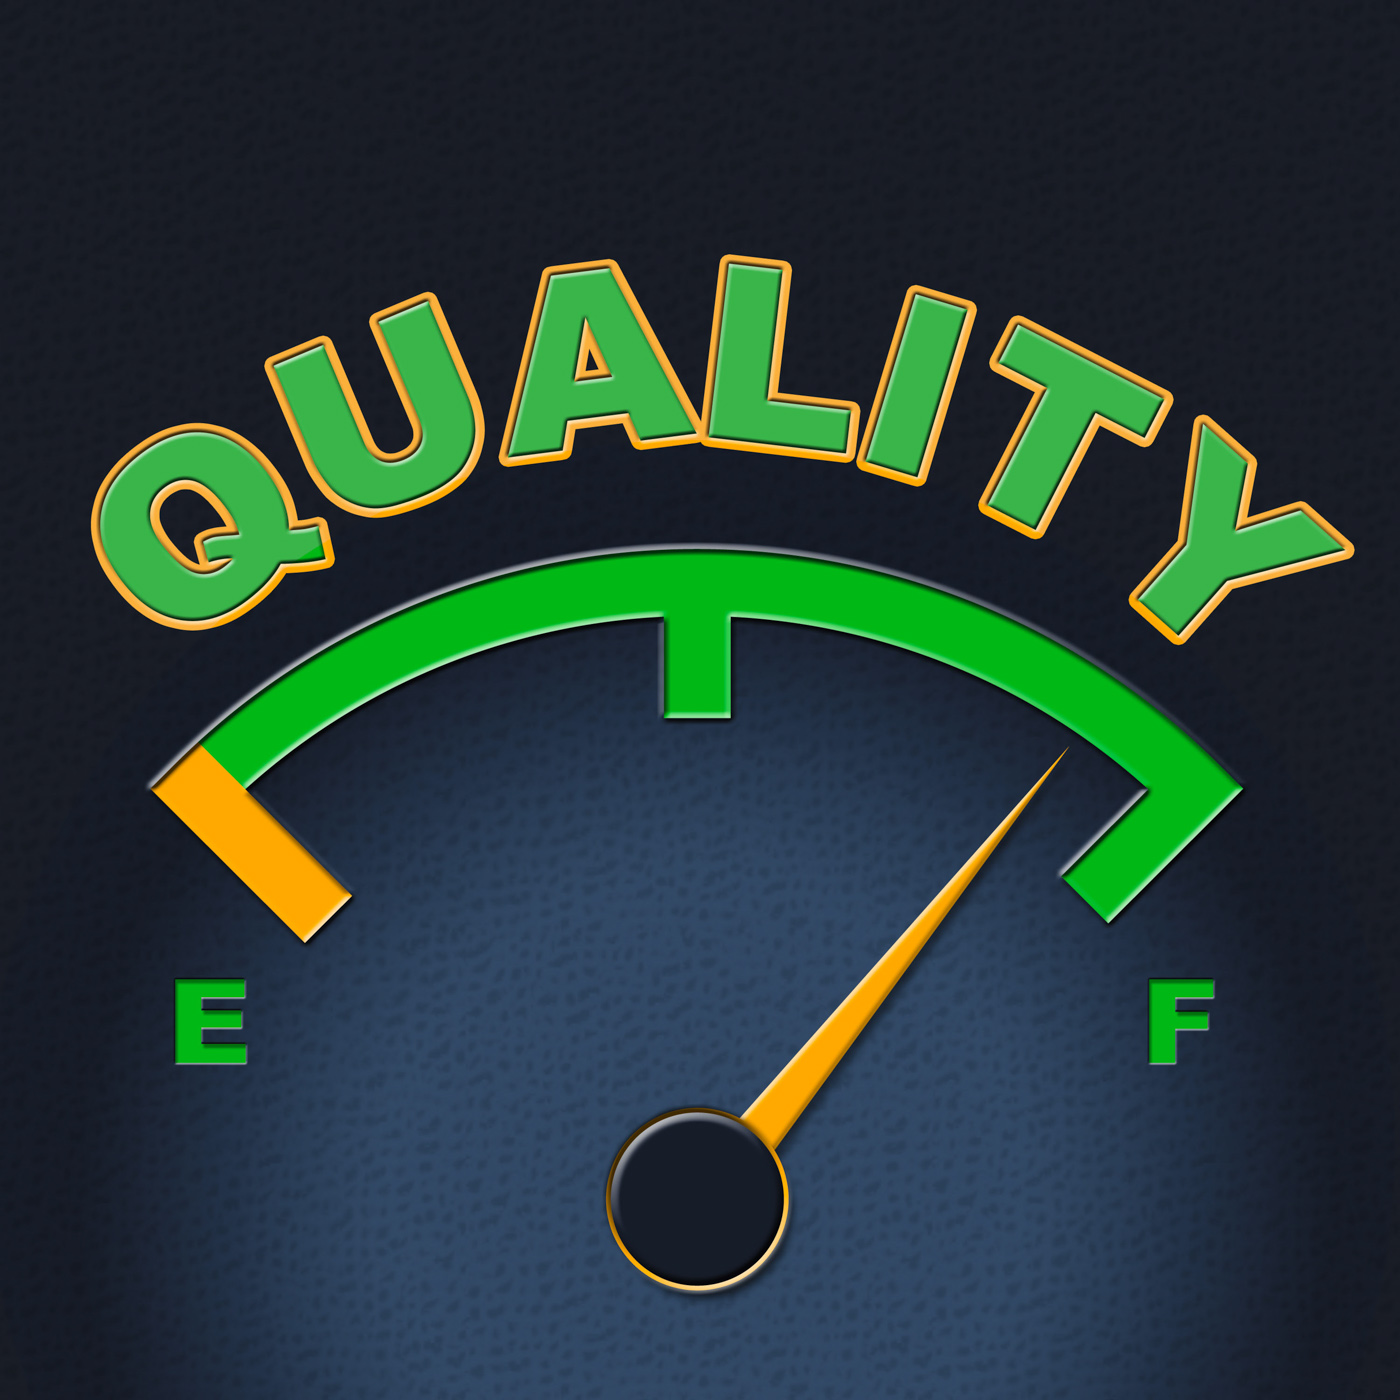 Quality gauge indicates perfect indicator and satisfaction photo